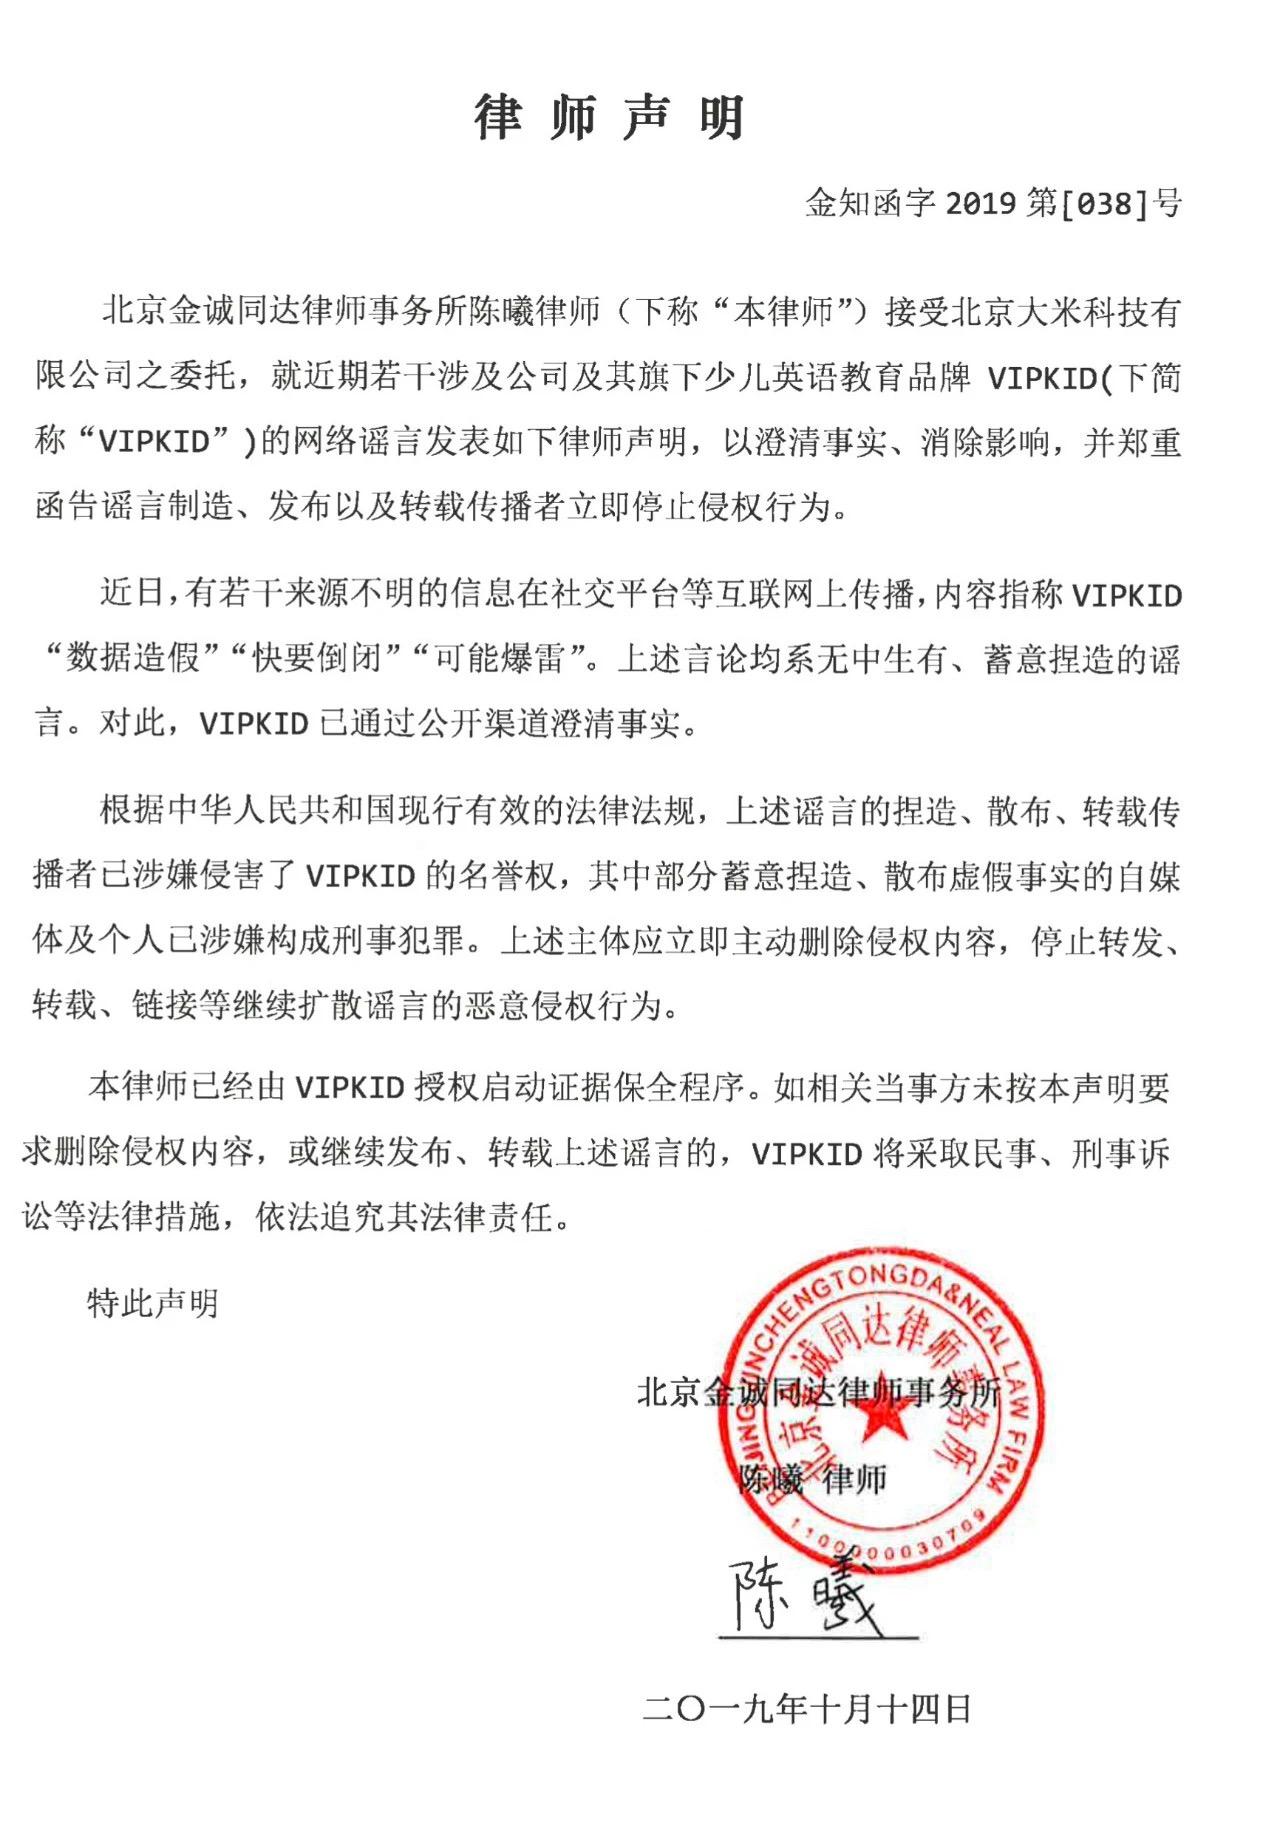 VIPKID官方回应融资暴雷传言:造谣,已启动法律程